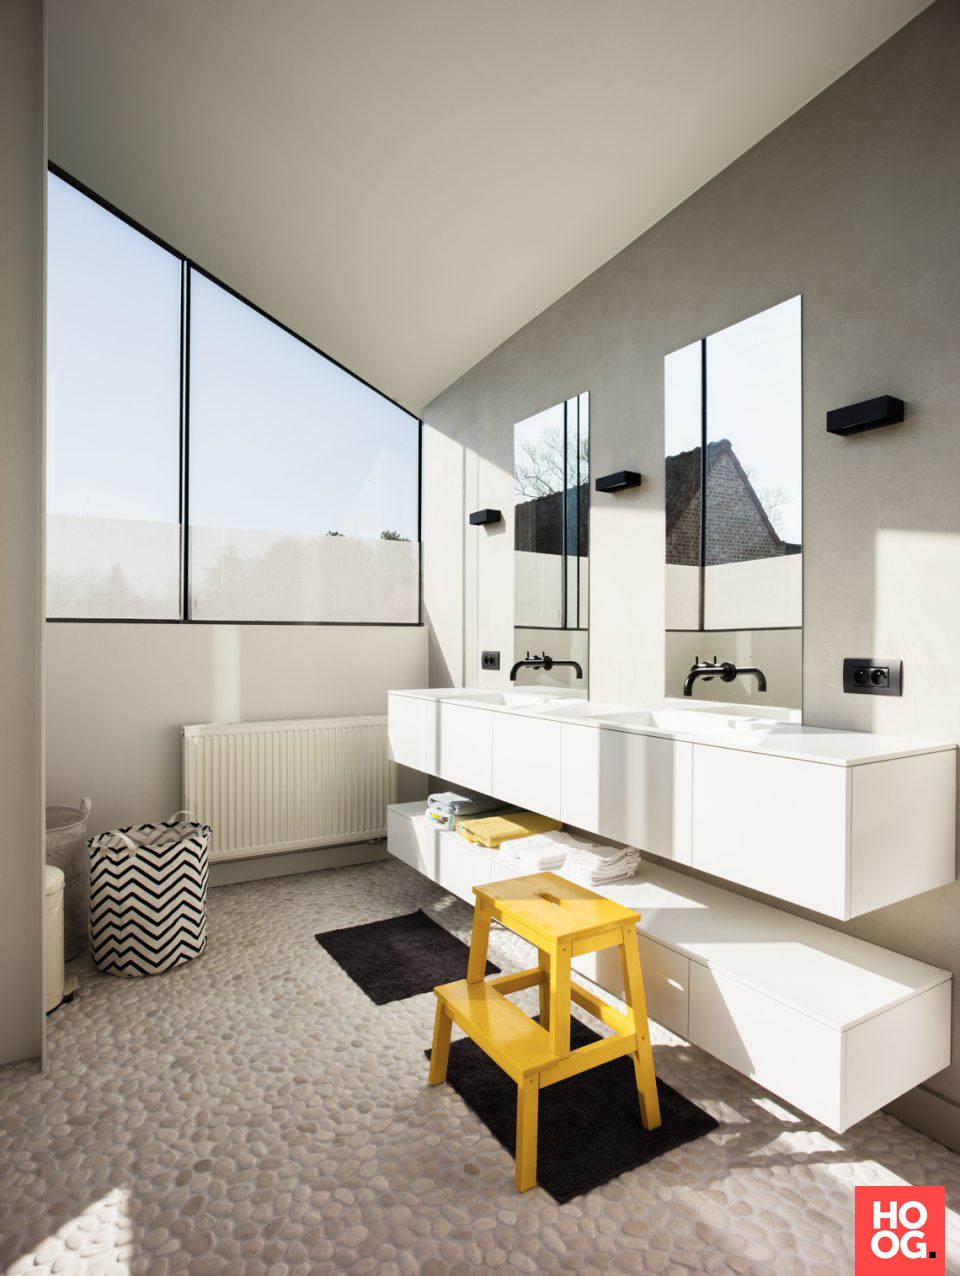 moderne strakke badkamer | badkamer ideeen | design badkamers ...